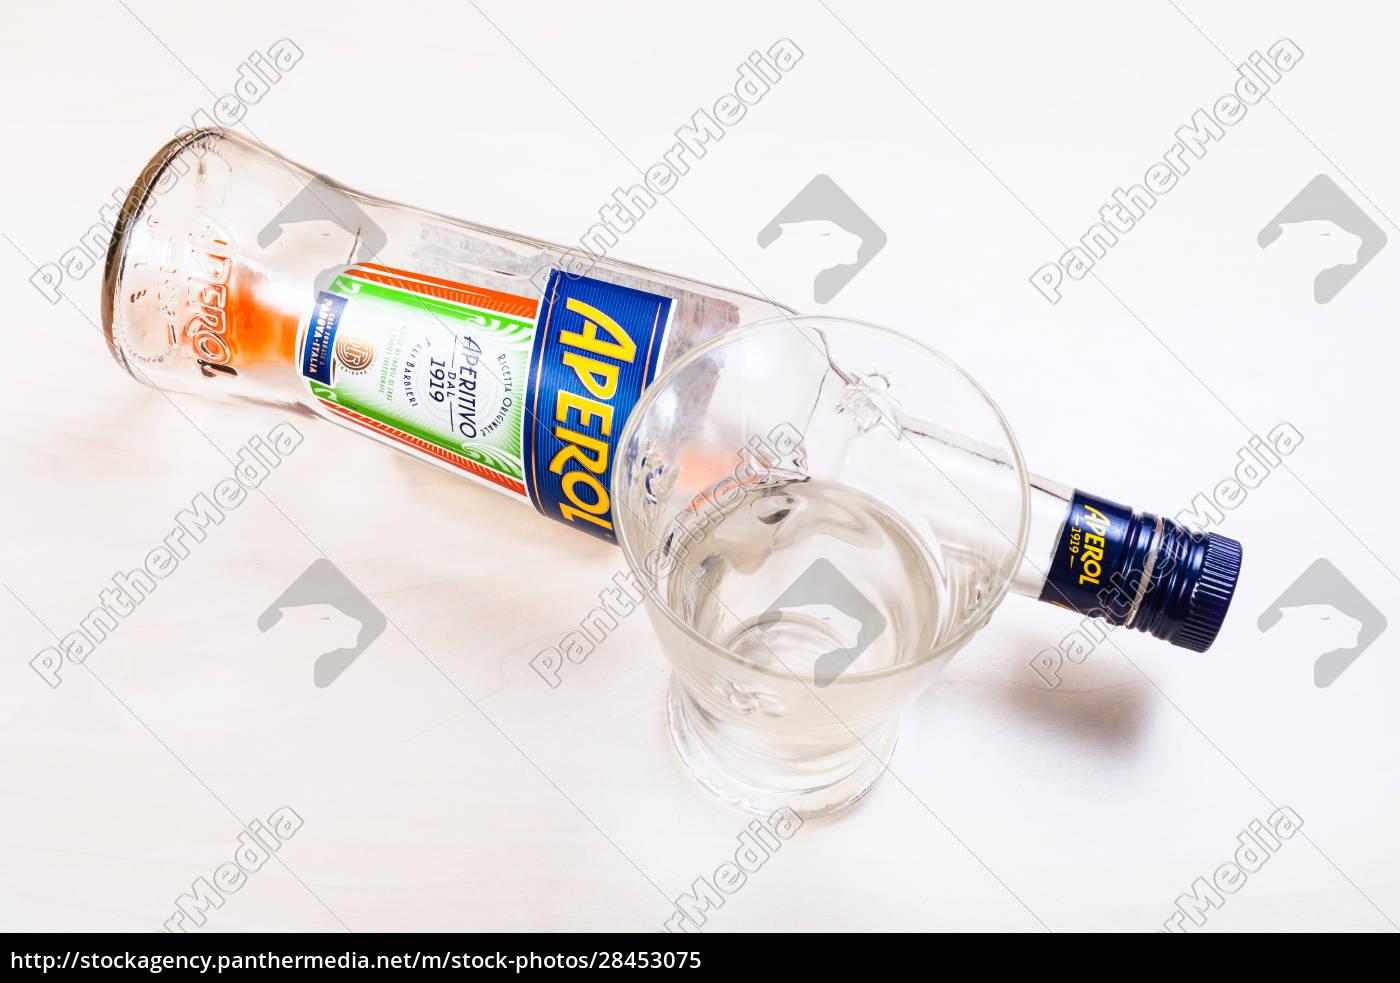 top, view, of, empty, bottle, of - 28453075